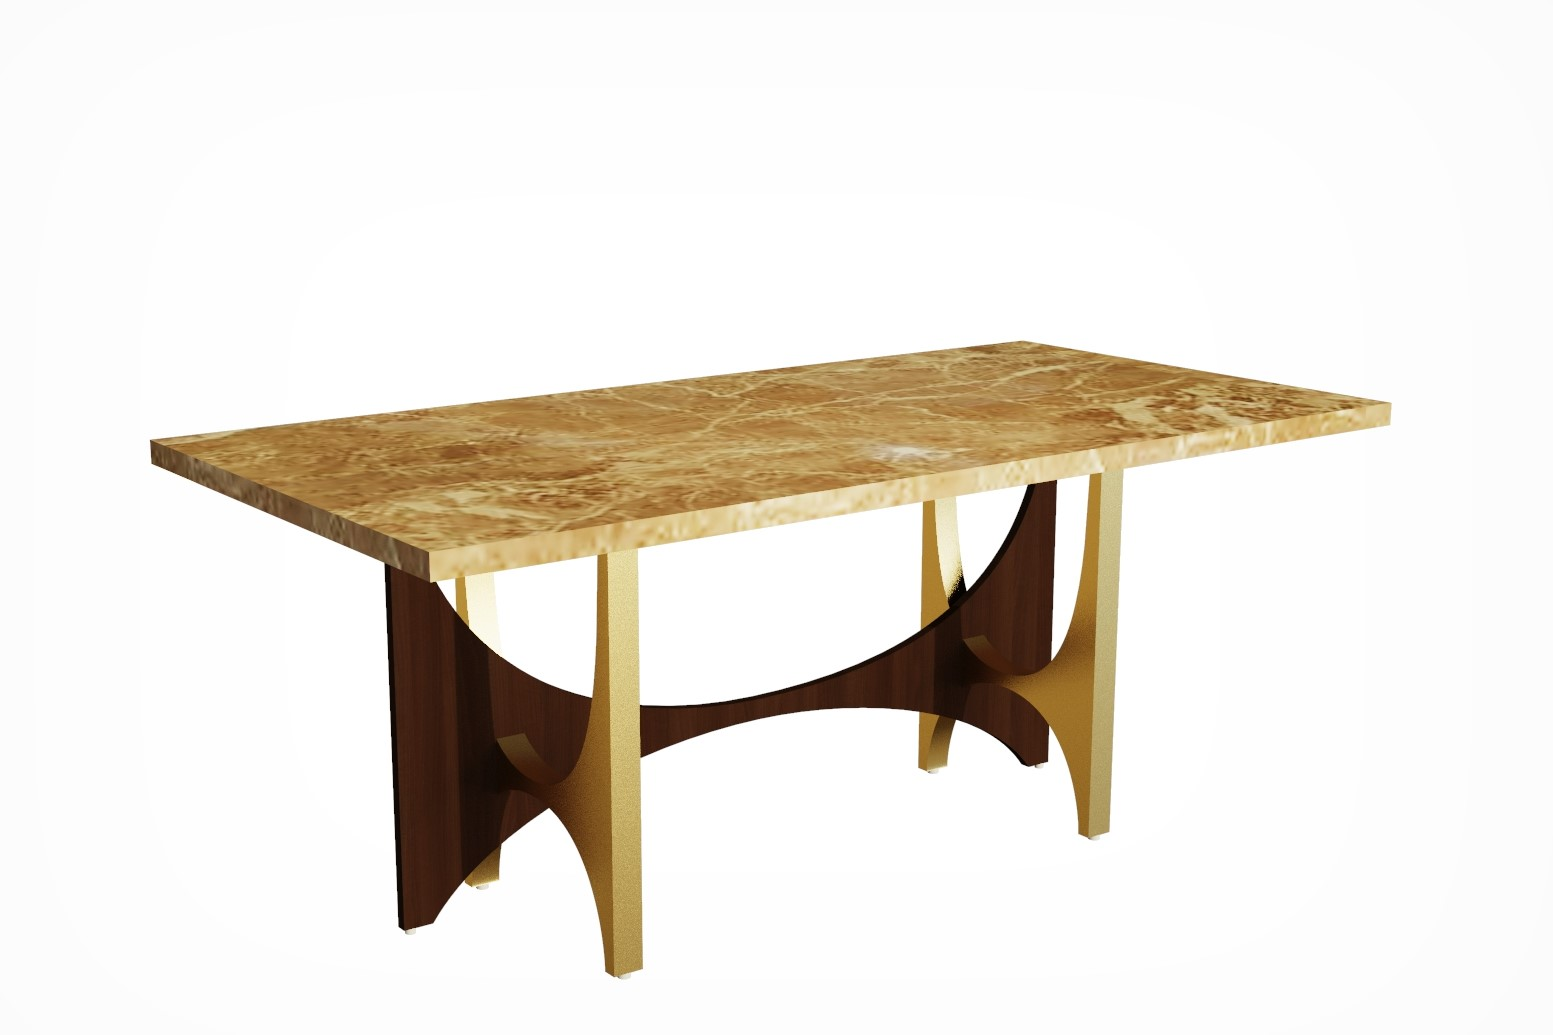 table_2_4_1.jpg